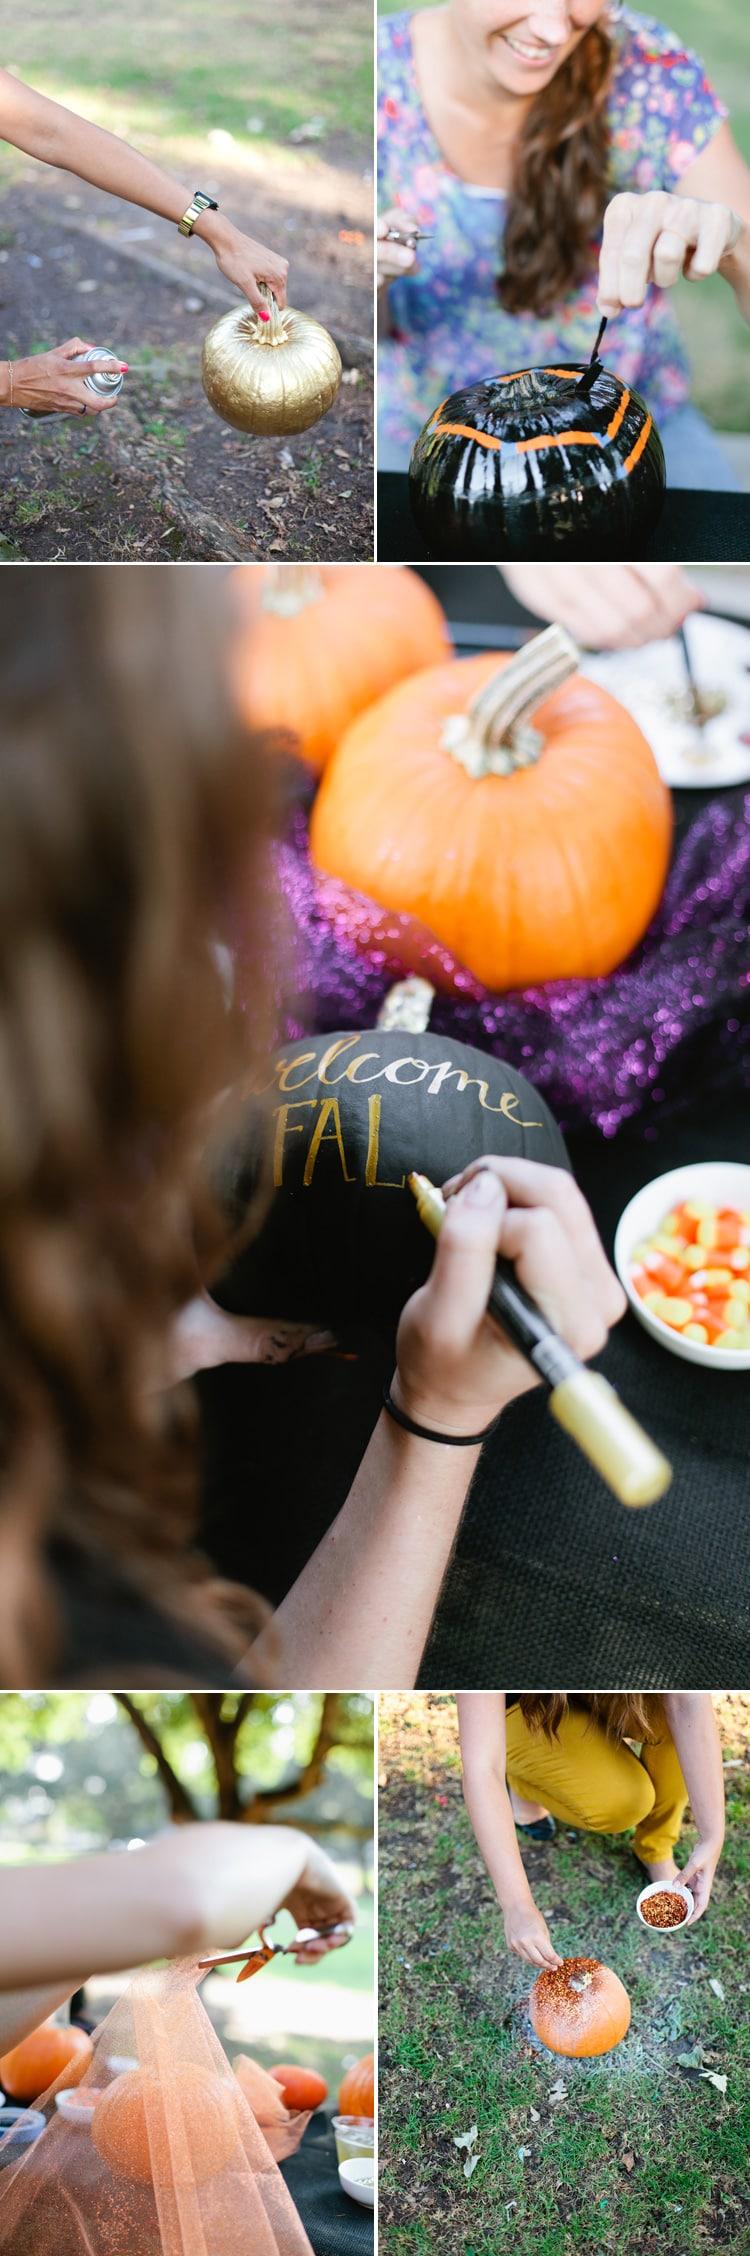 No-Carve-Pumpkin-Party-6